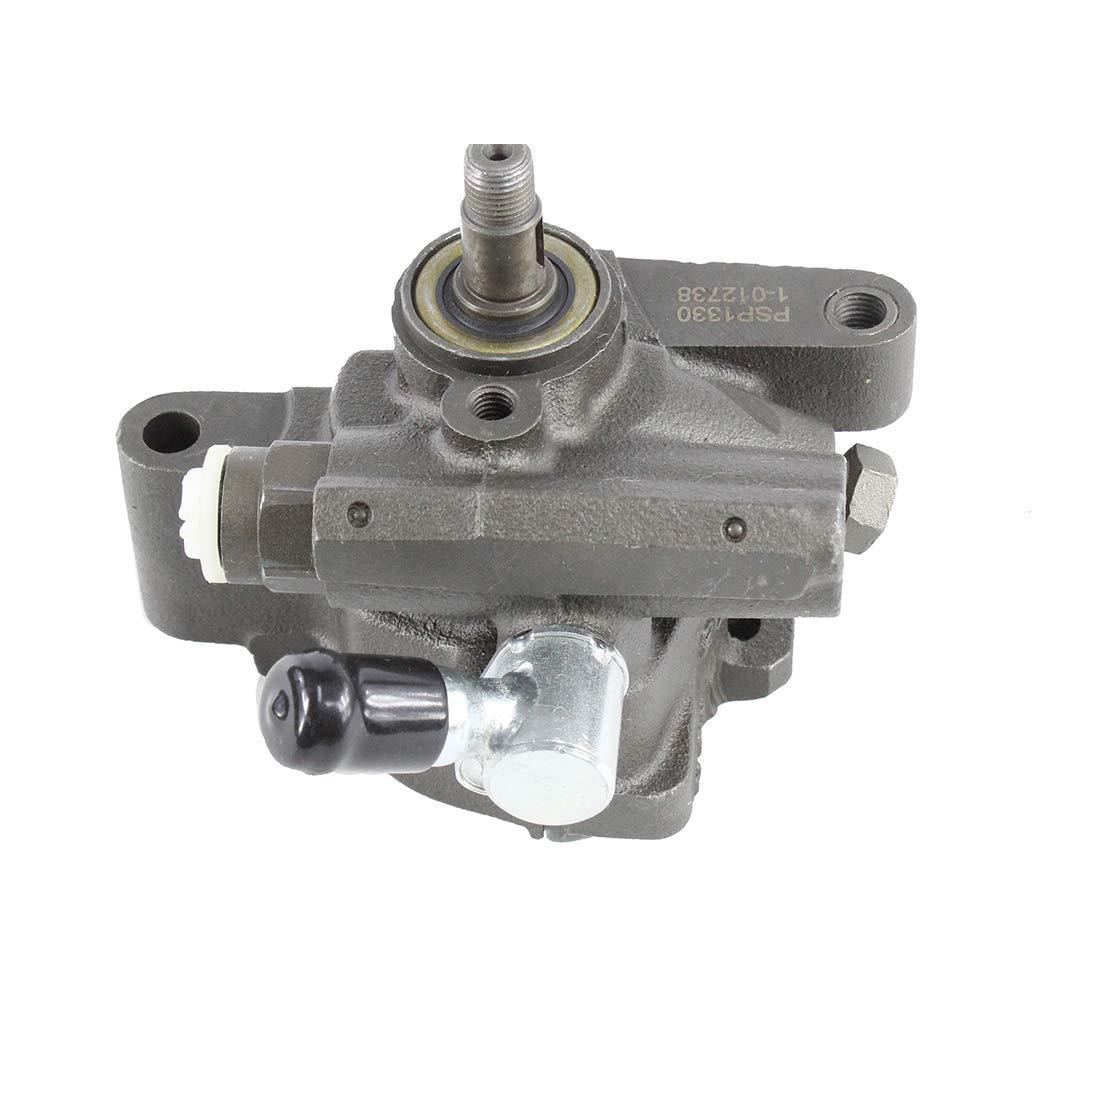 Brand new DNJ Power Steering Pump PSP1330 for 97-00 No Core Needed Toyota RAV4 2.0L Cu.122 Electric DOHC